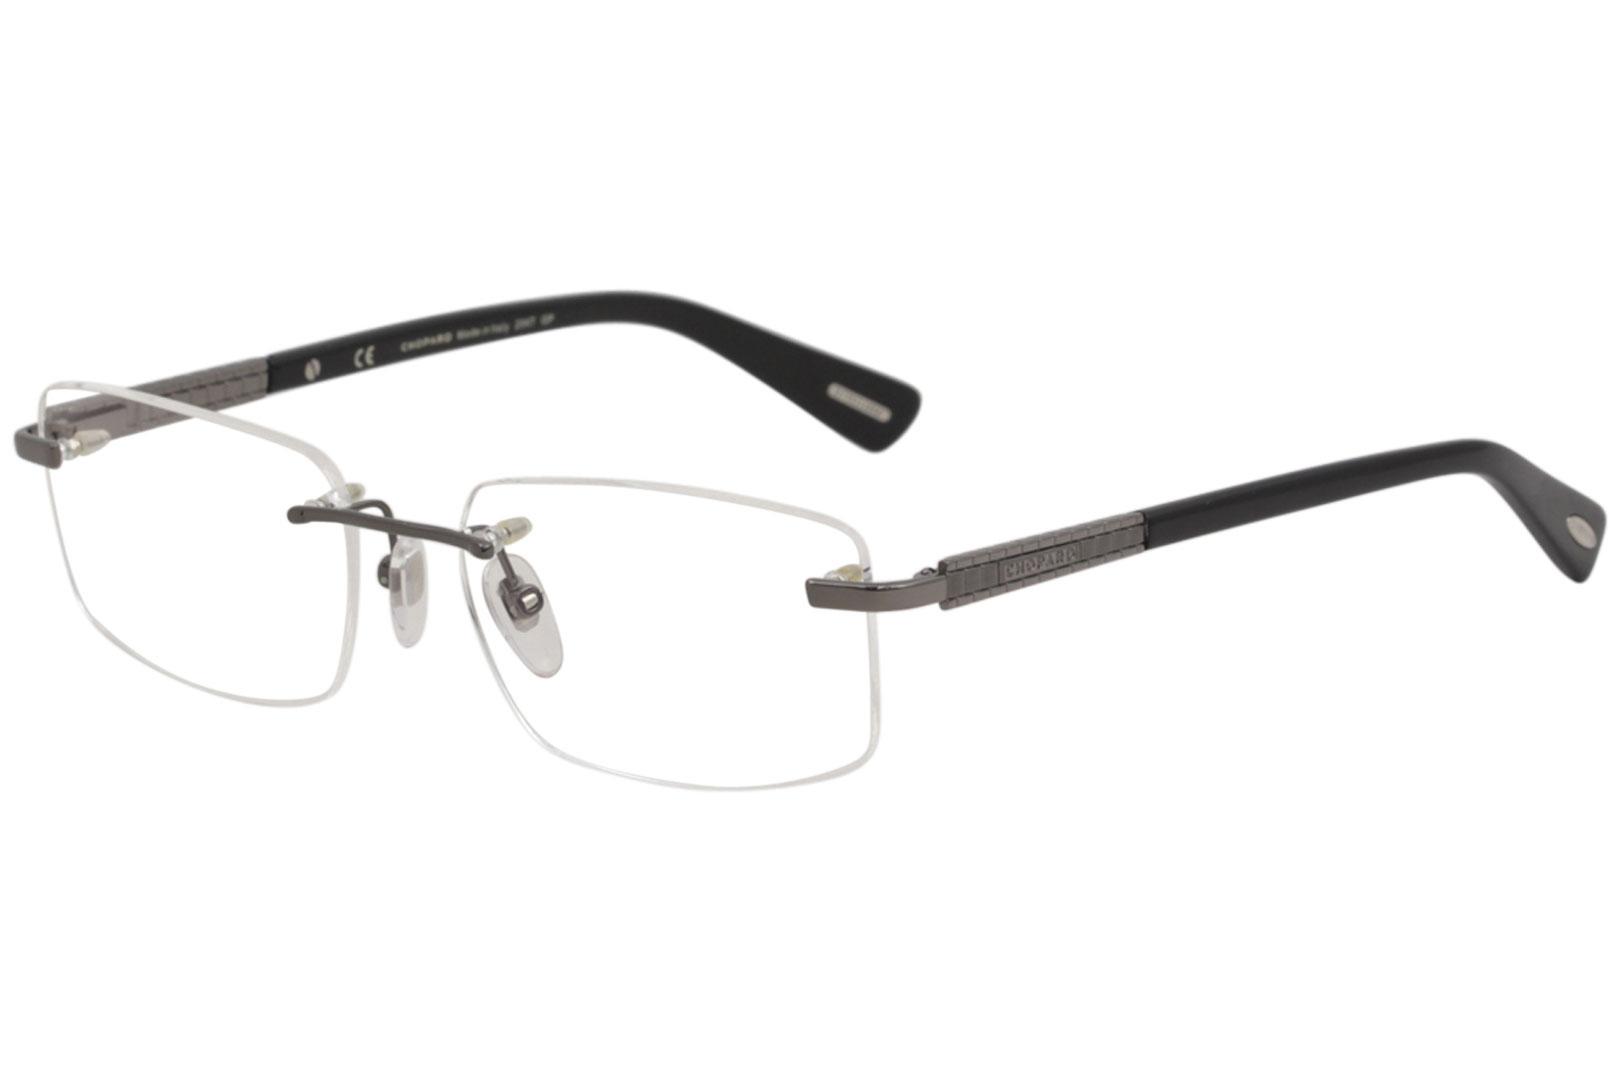 cb3de2a048 Chopard Eyeglasses VCHB37 VCHB 37 0568 Gunmetal 23K Gold Optical ...